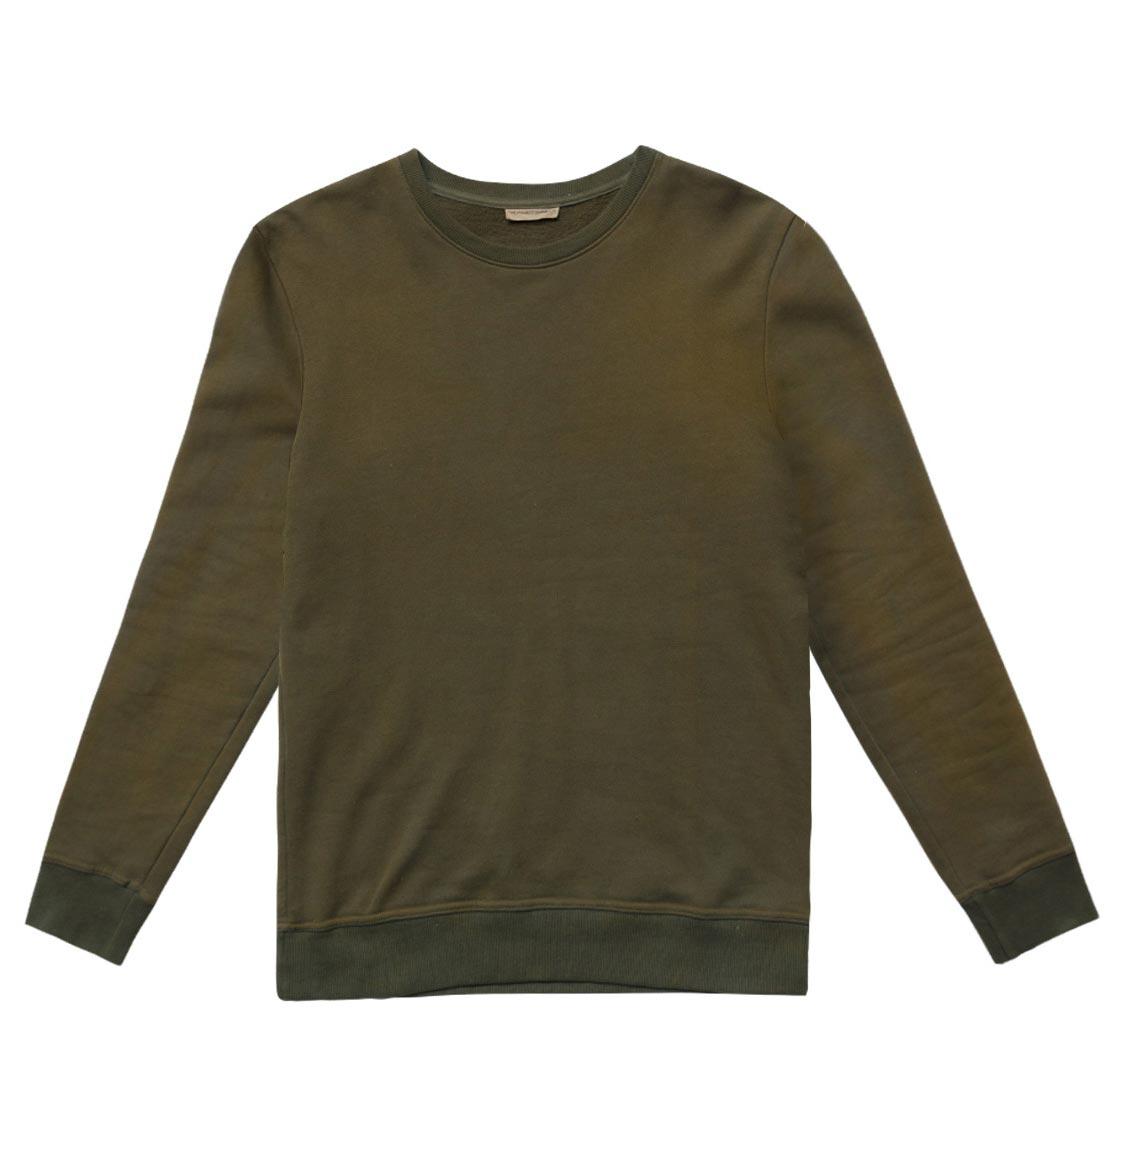 The Project Garments Acid Dye Organic Cotton Crew Neck Sweatshirt Khaki